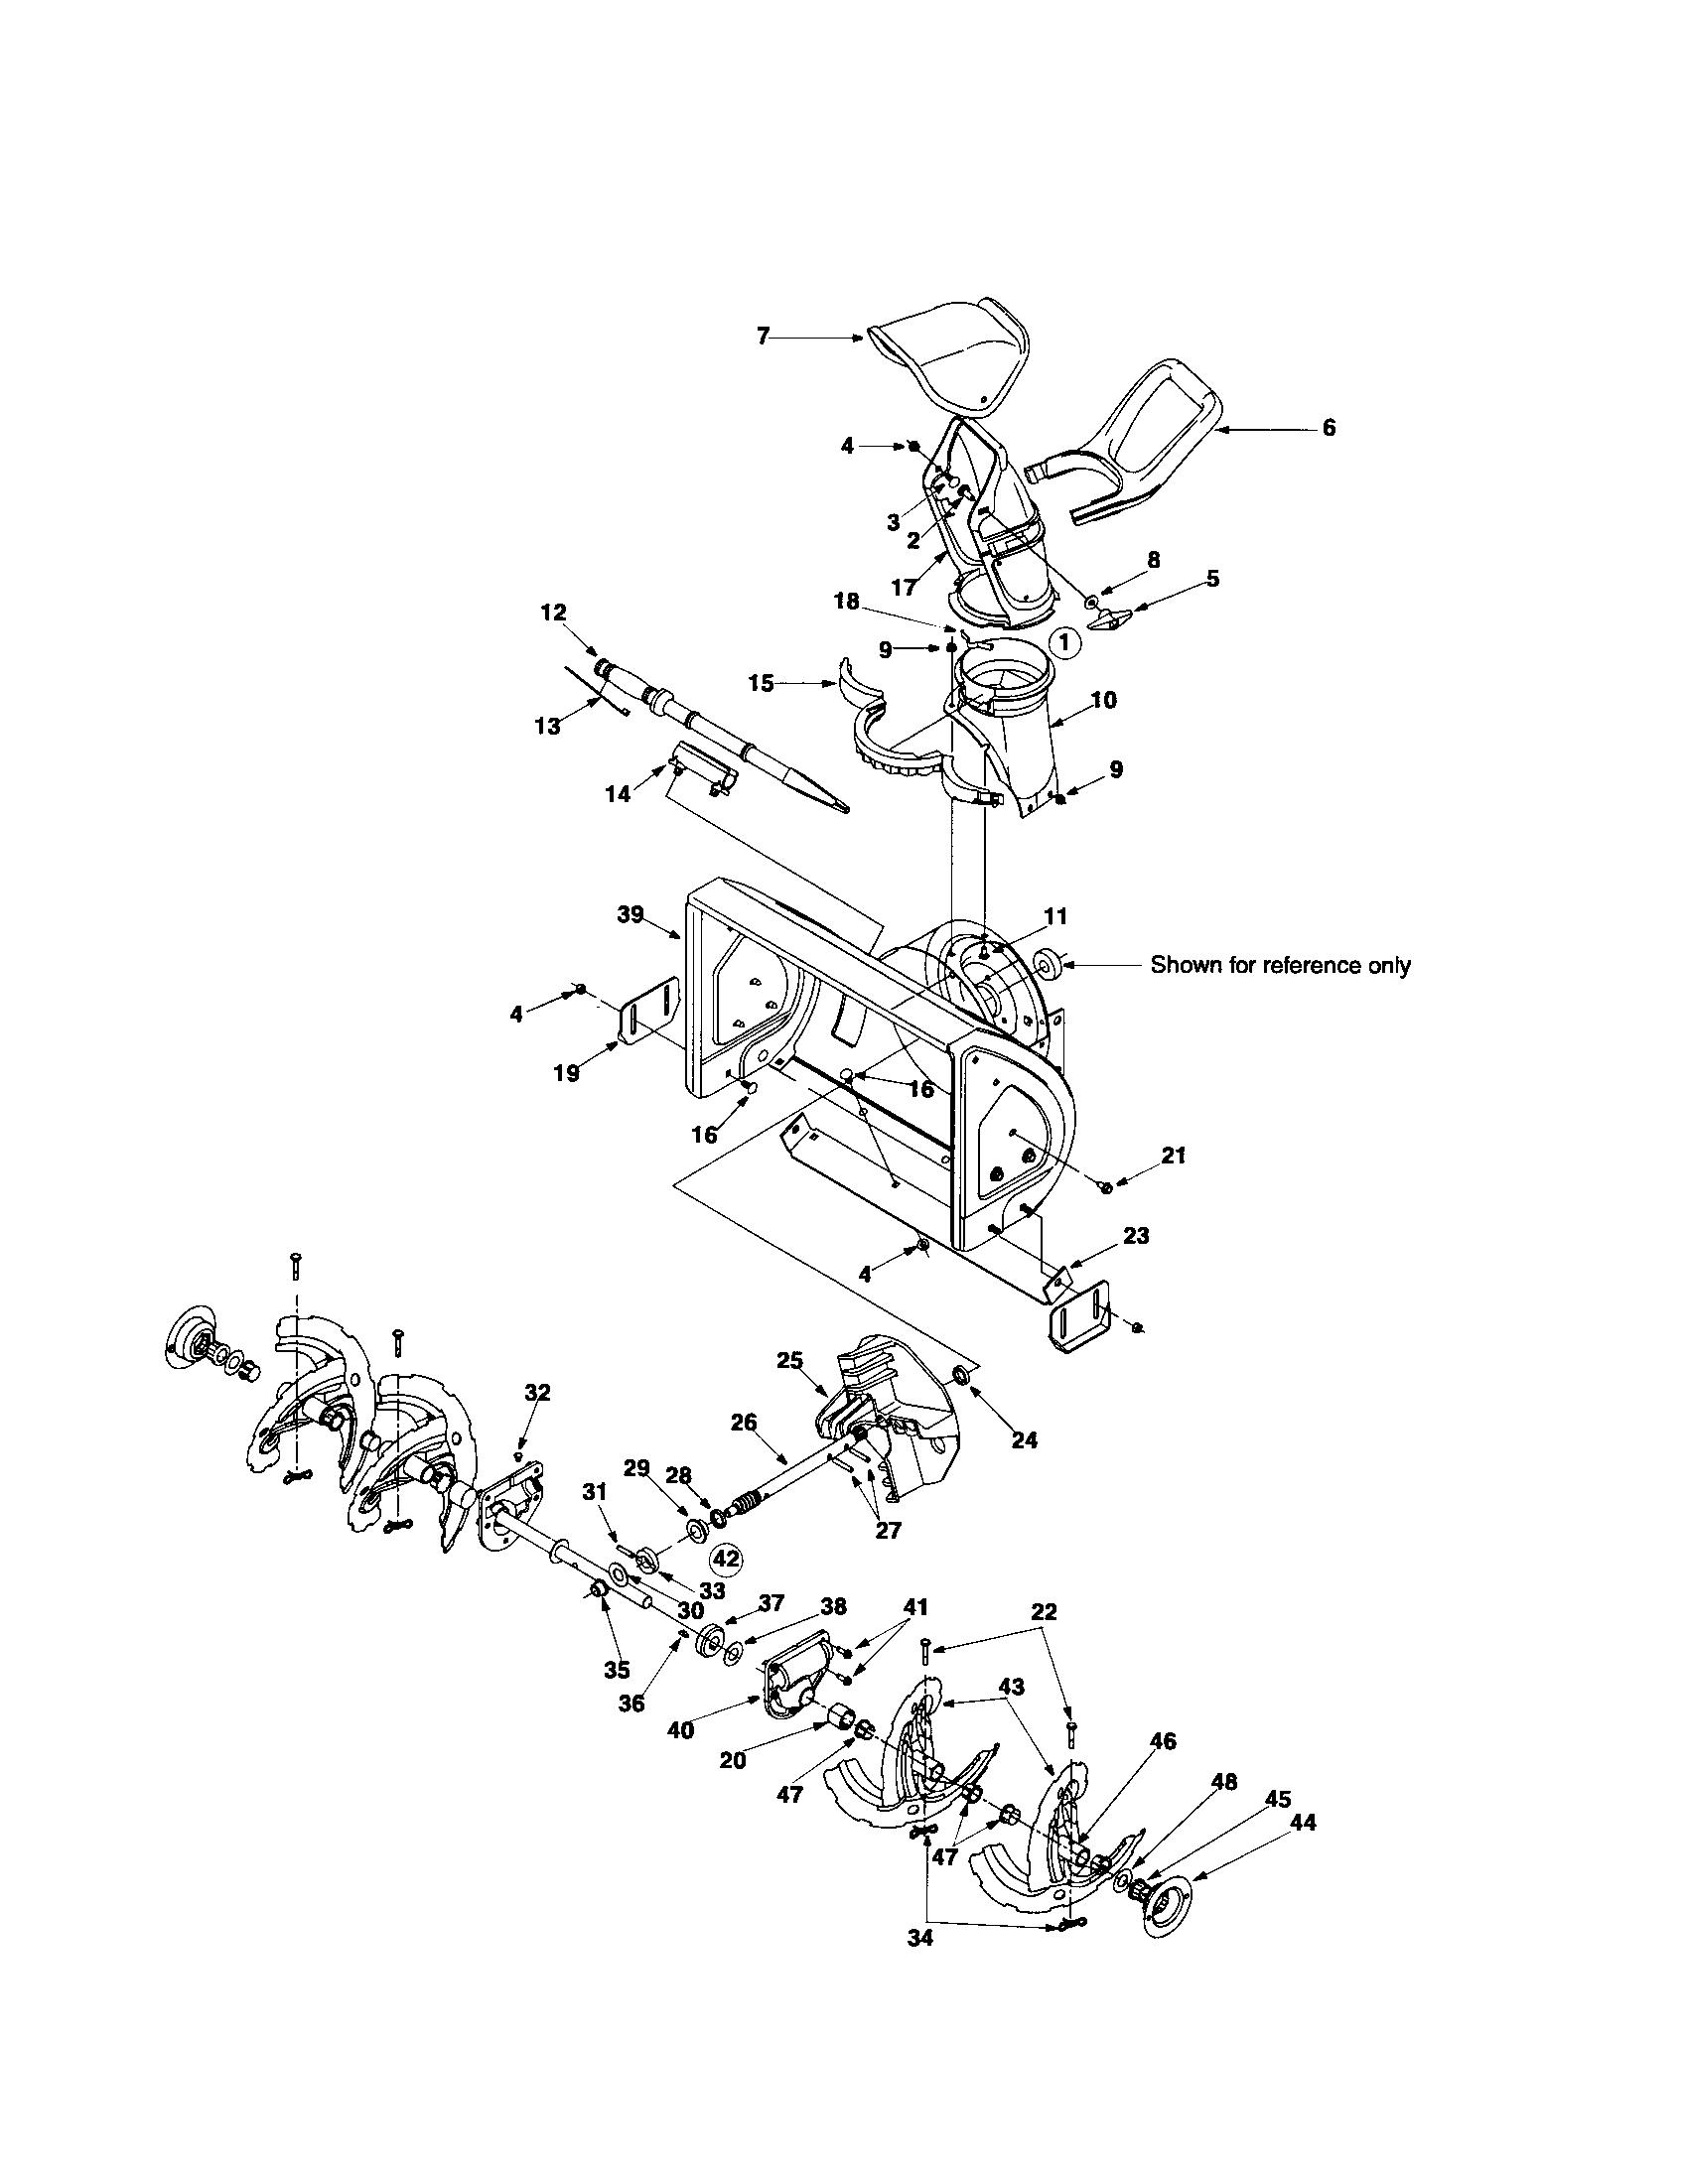 CHUTE/AUGER/IMPELLER Diagram & Parts List for Model